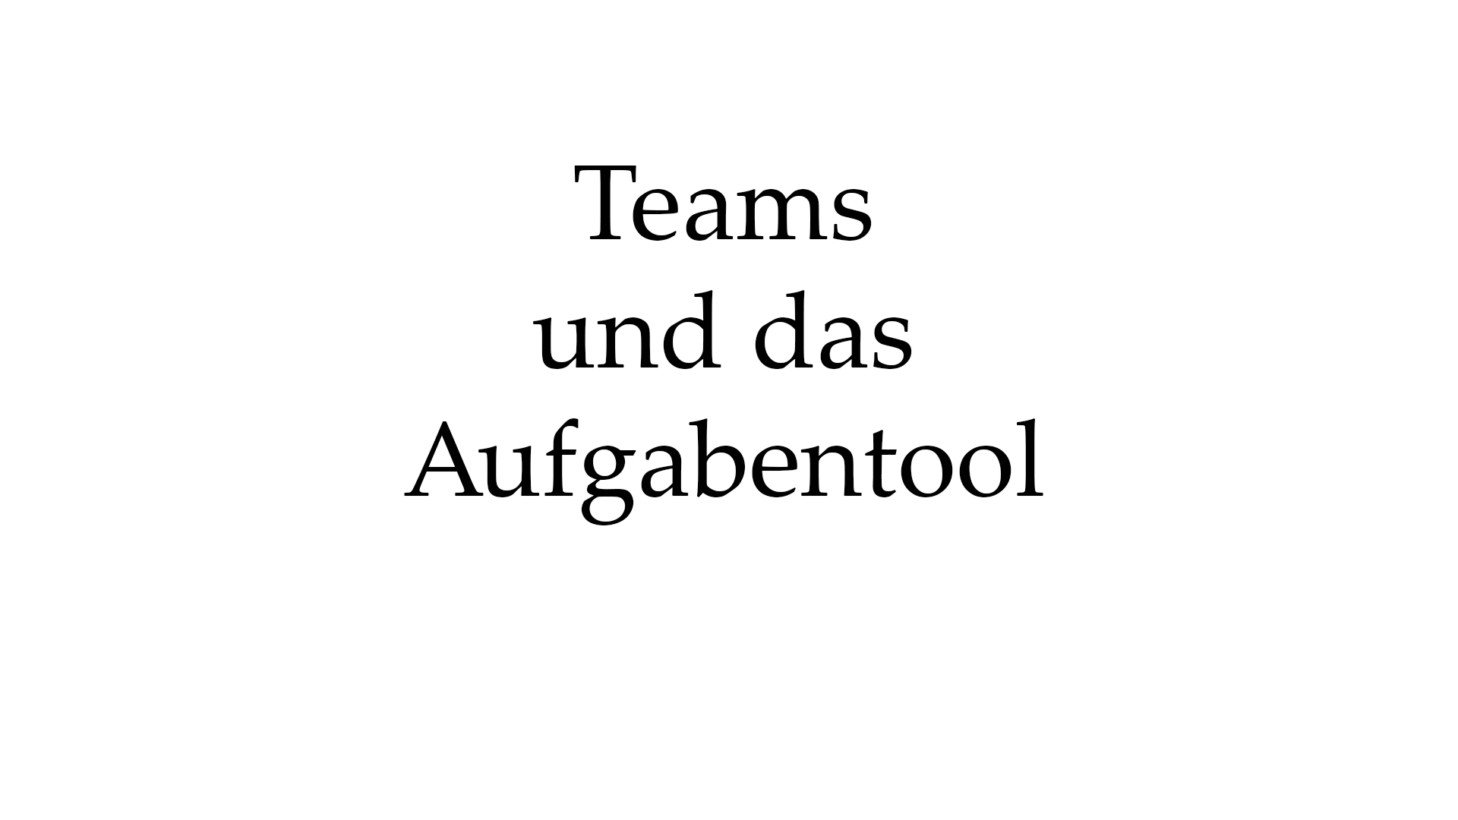 Teams und das Aufgabentool